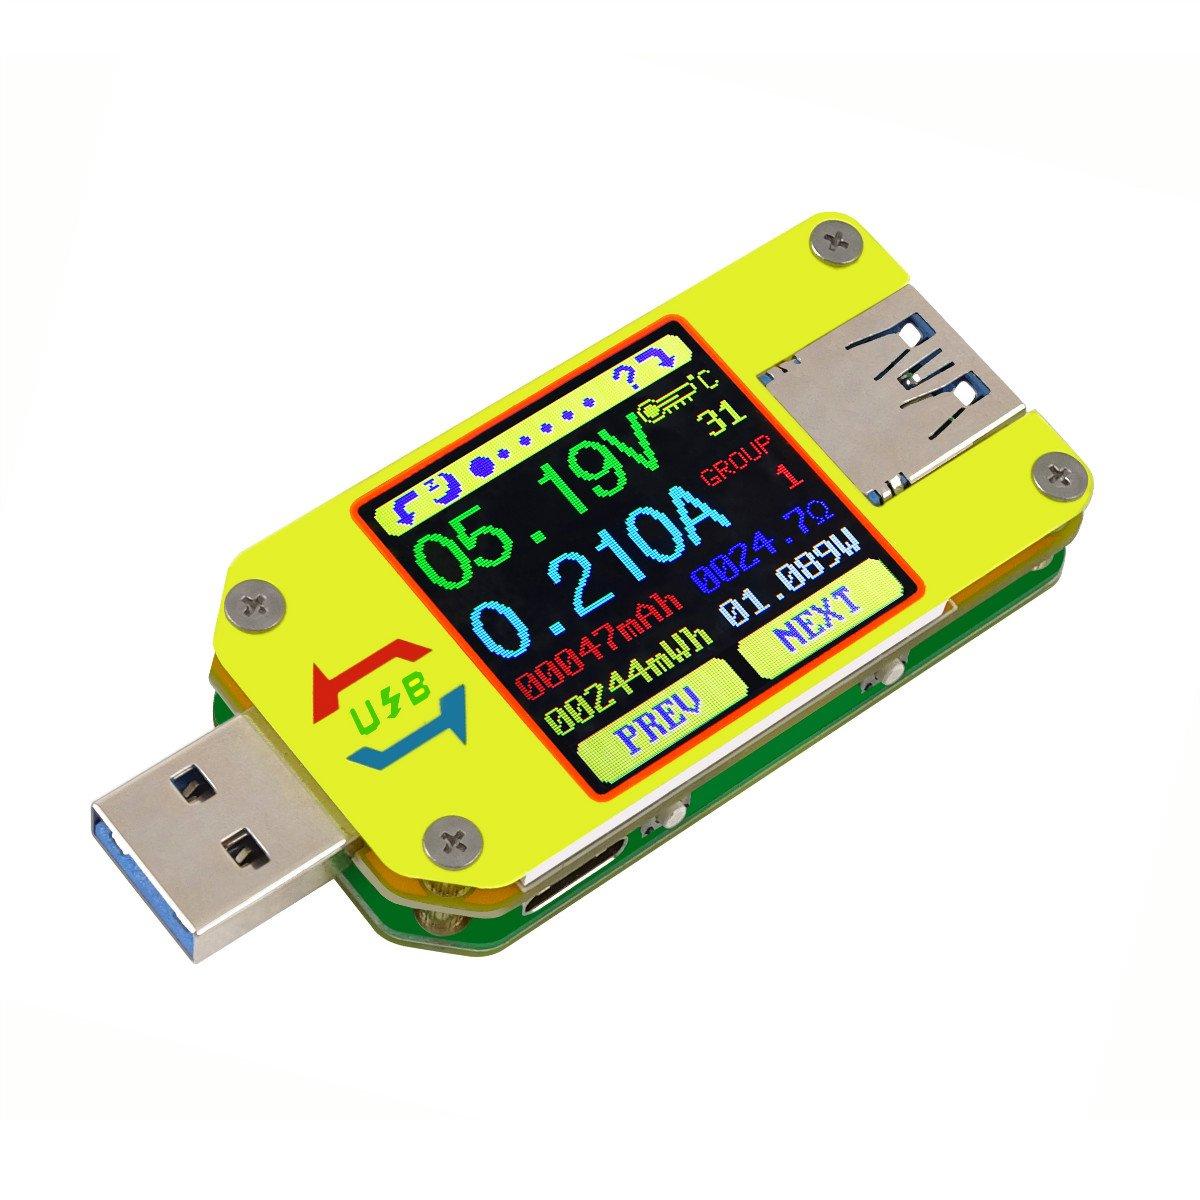 UM34C USB 3.0 Multimeter Bluetooth USB Voltmeter Ammeter and USB Electronic Load Tester Resistor USB Voltage Current Battery Power Capacity Charger Temperature Load Meter Tester